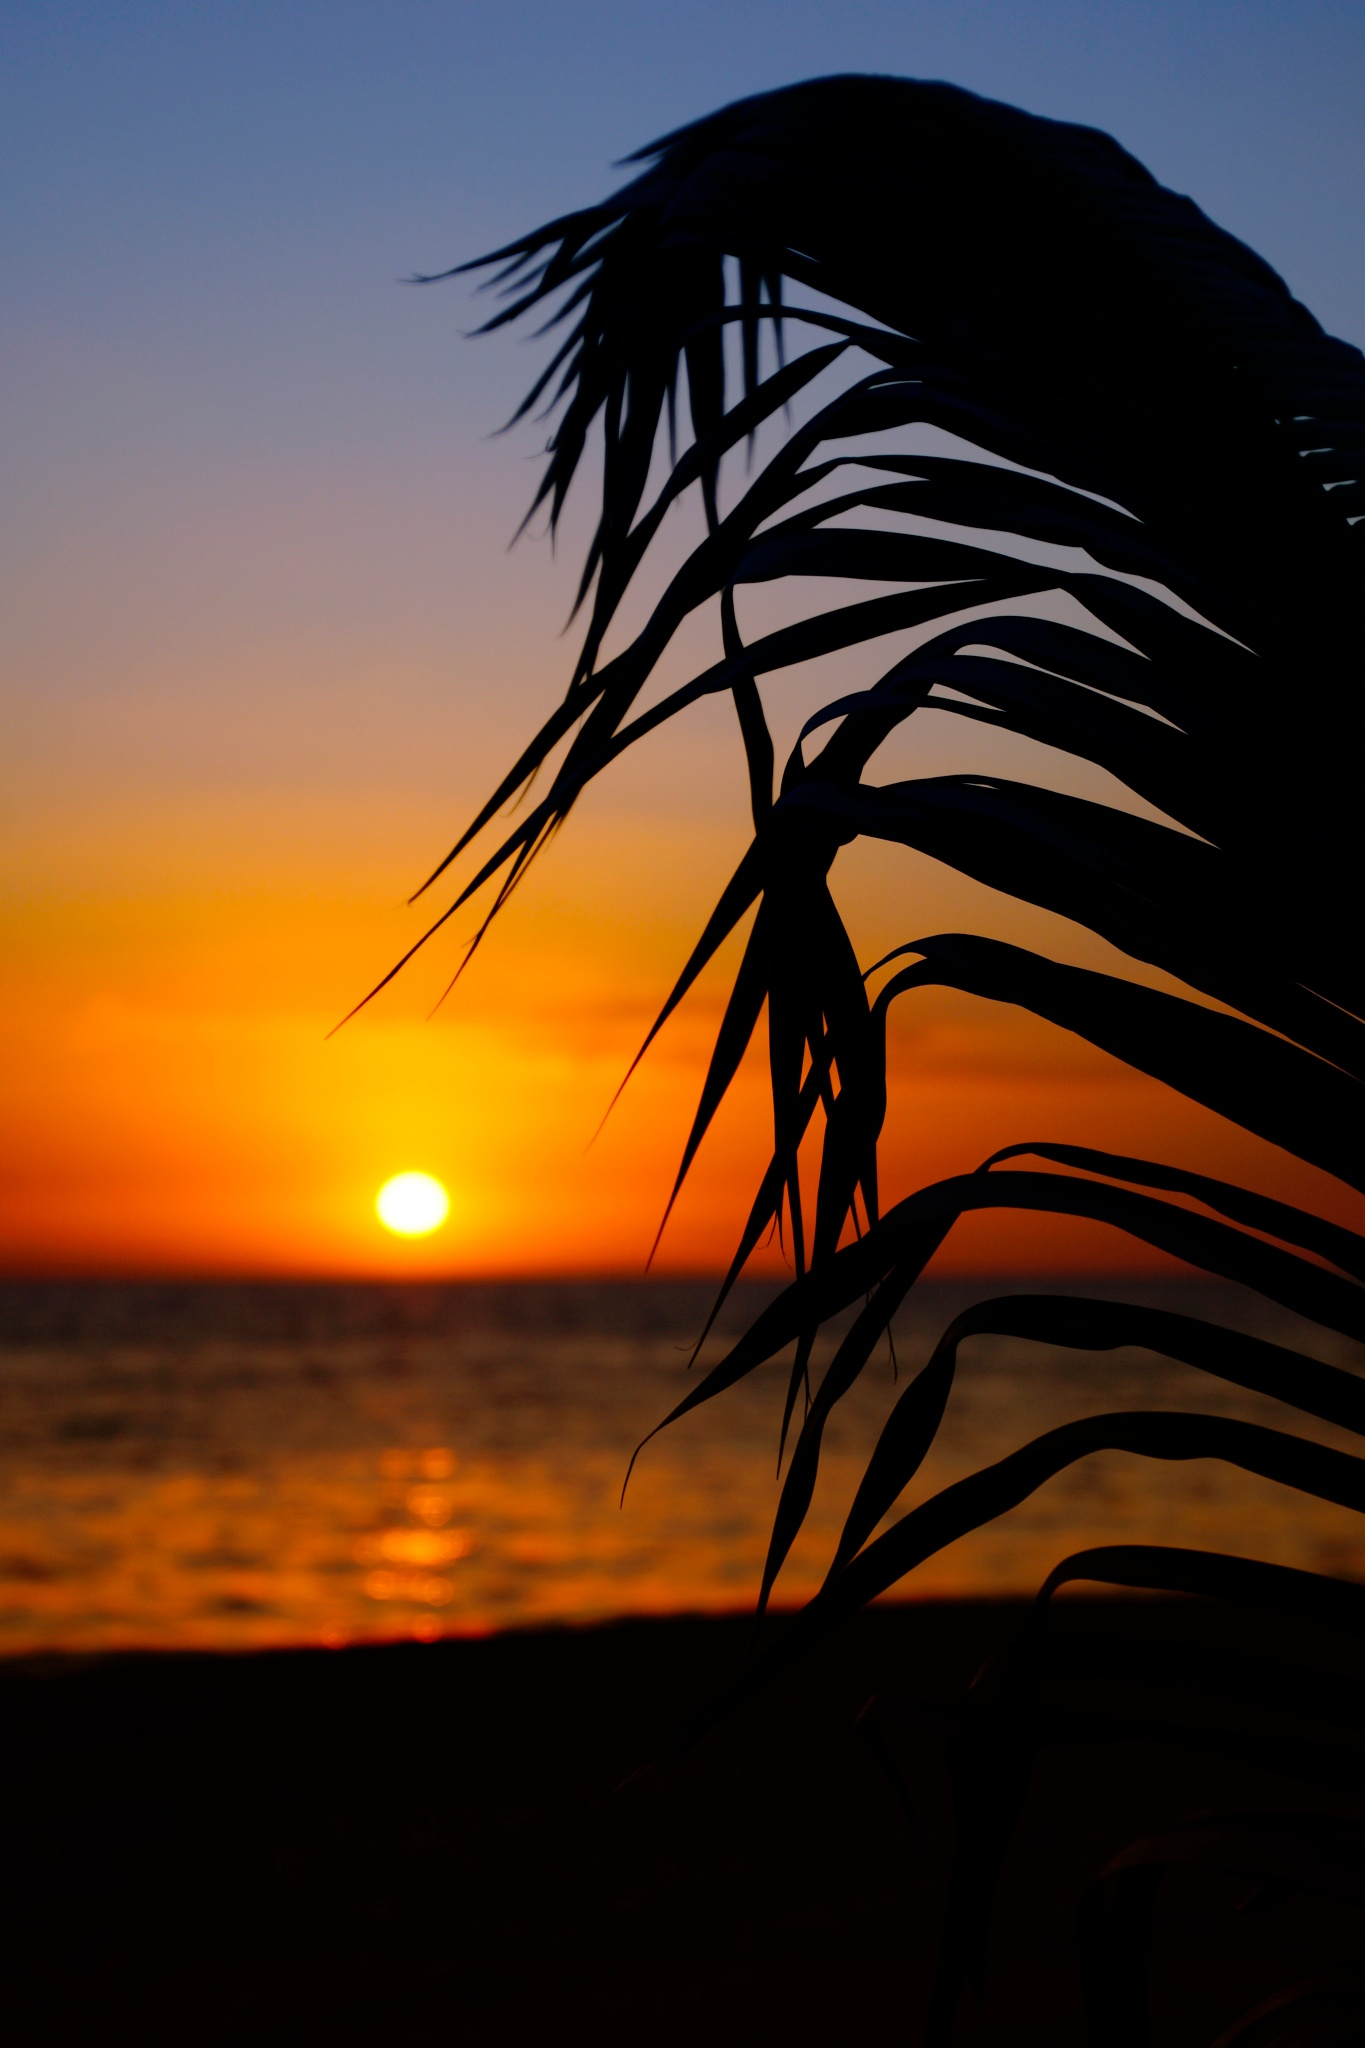 Sunset Haiti by sylviecorriveau